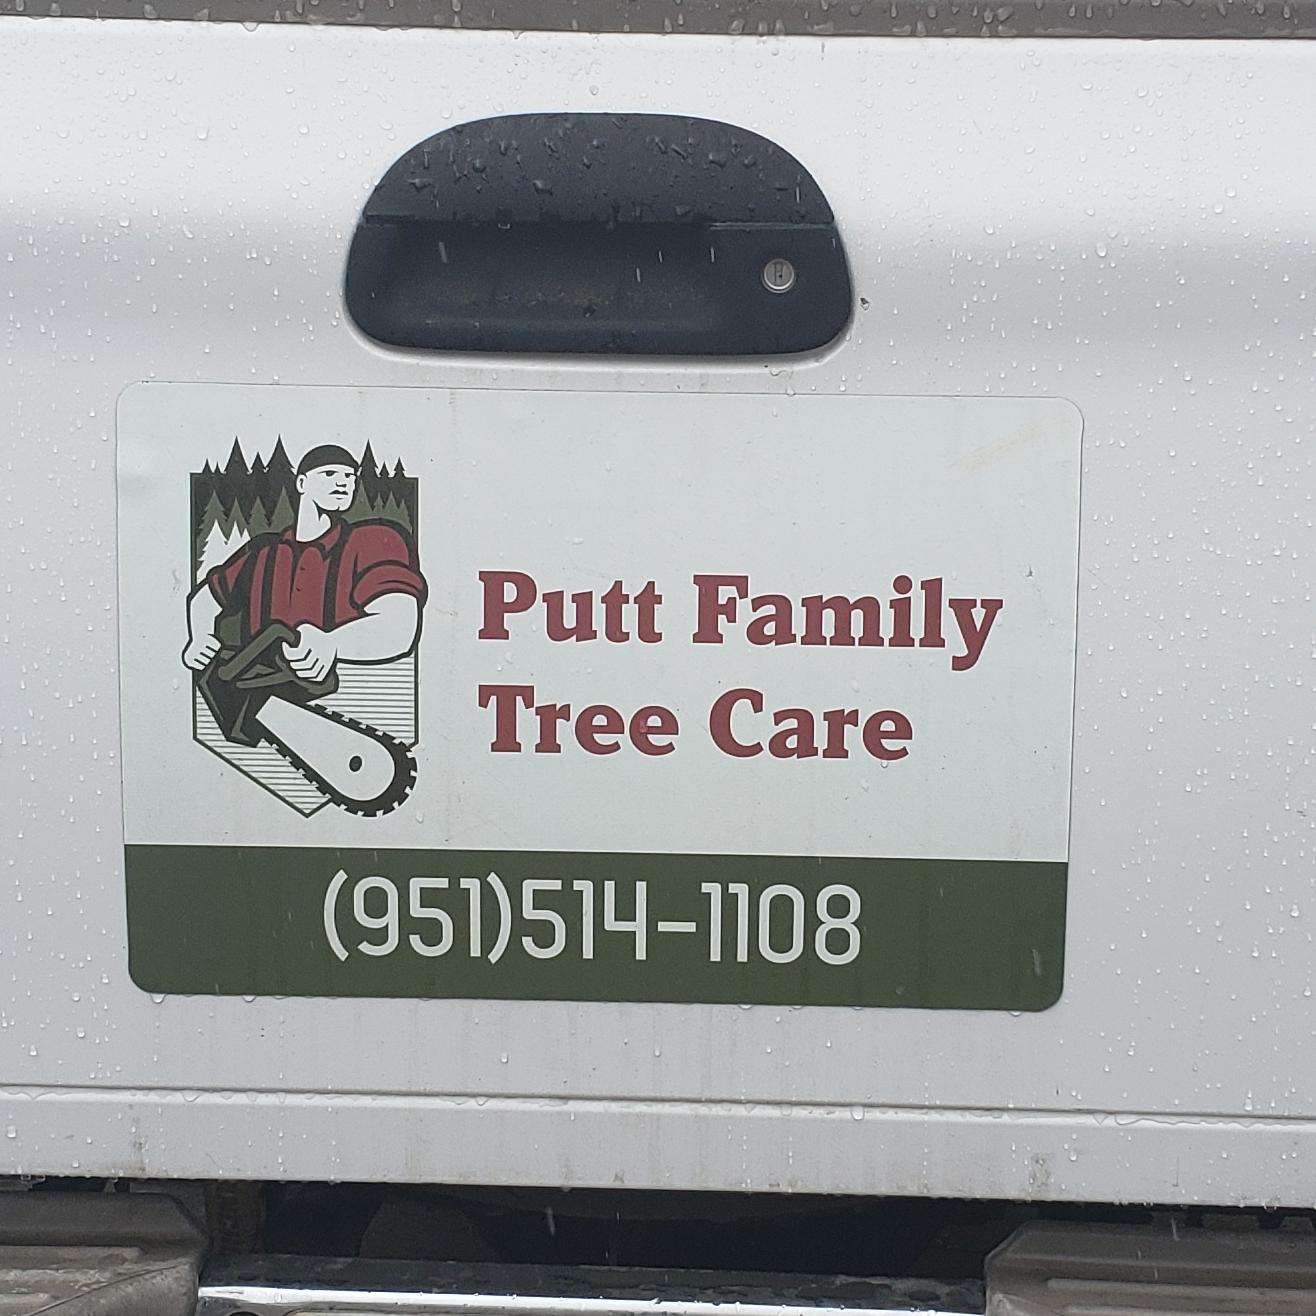 Putt Family Tree Care